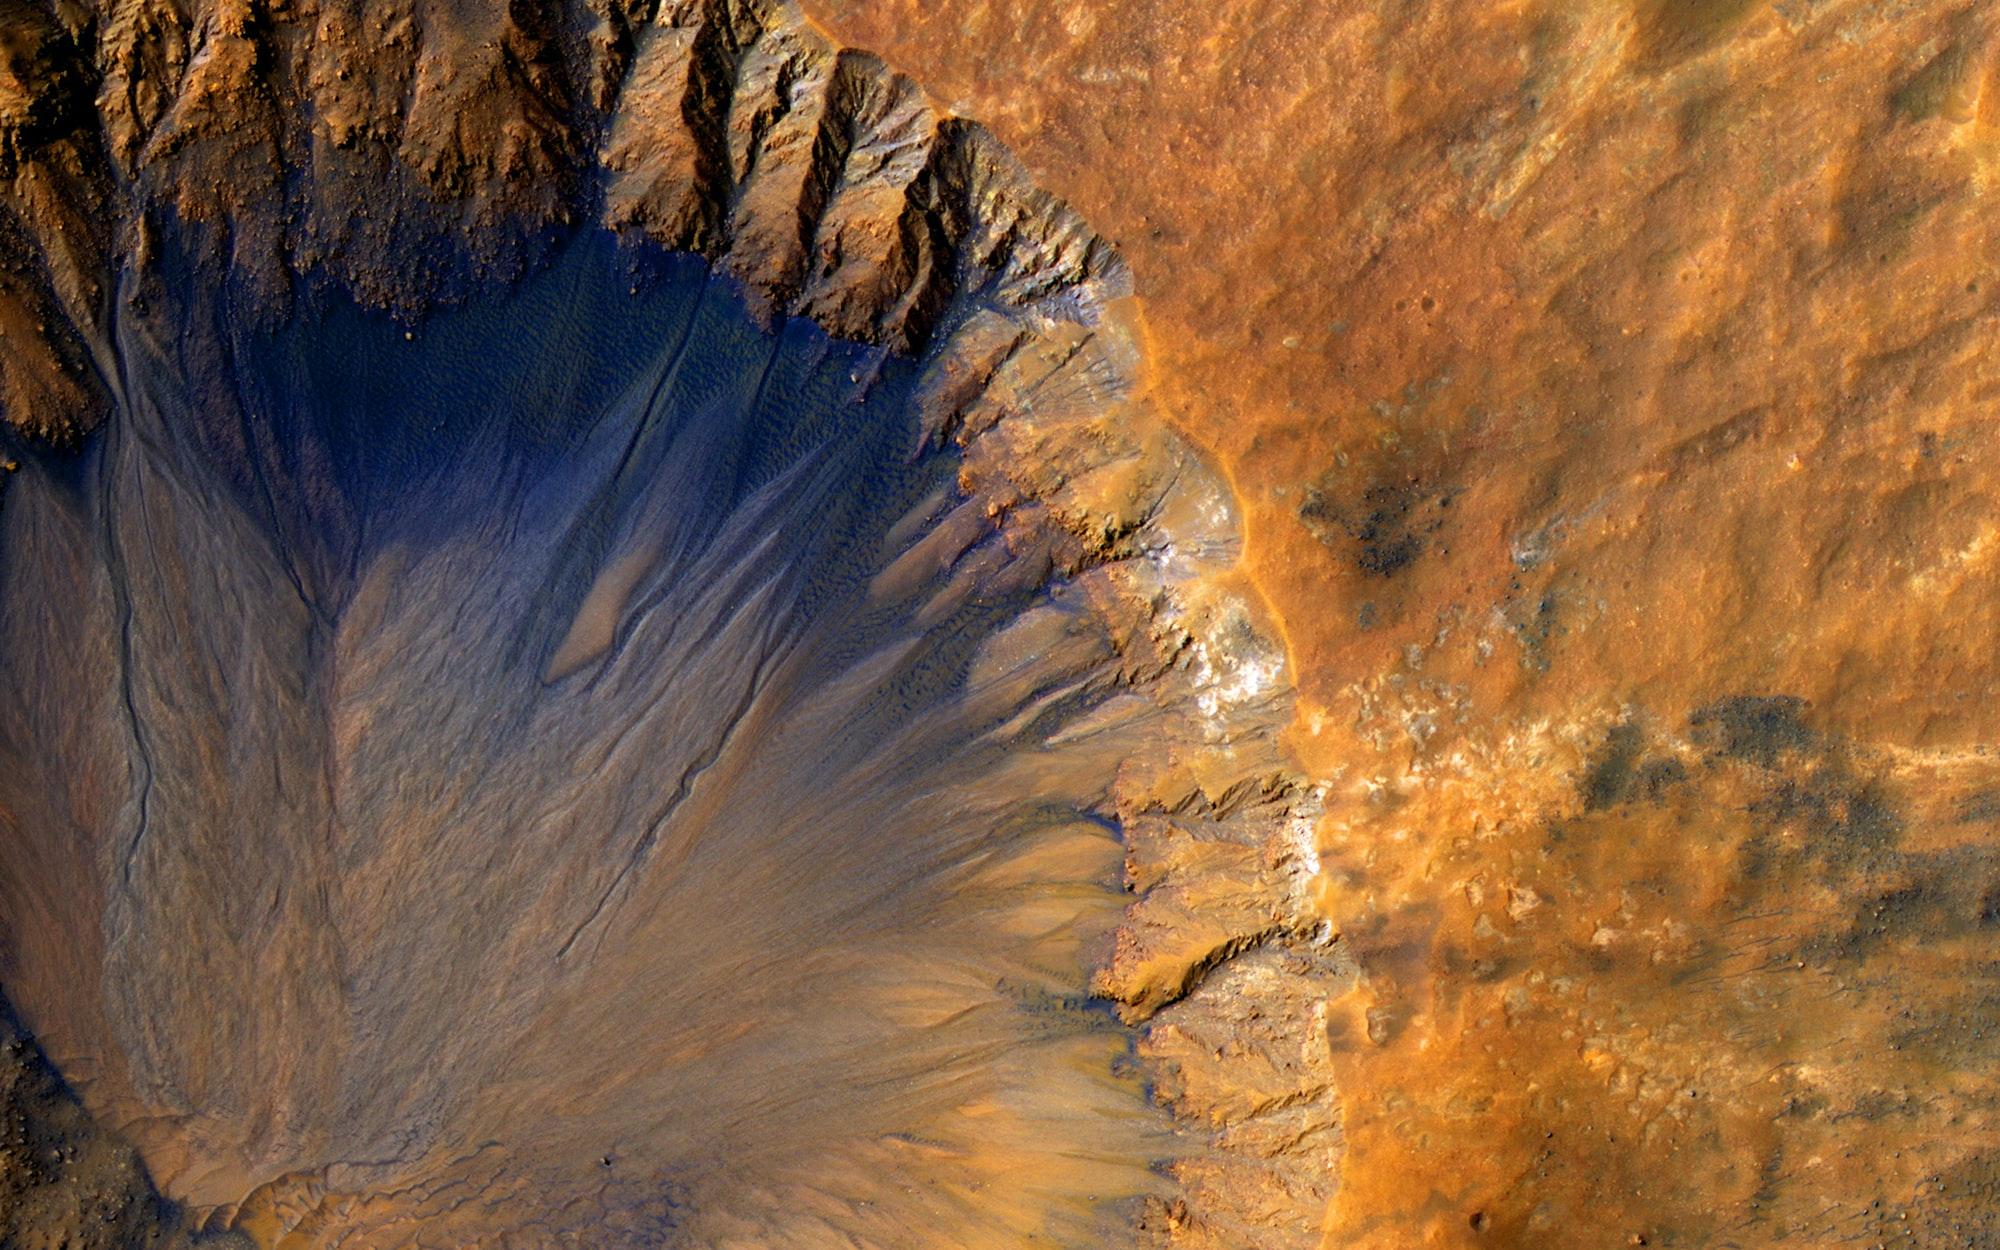 A Warm, Wet (but still stinky) Mars